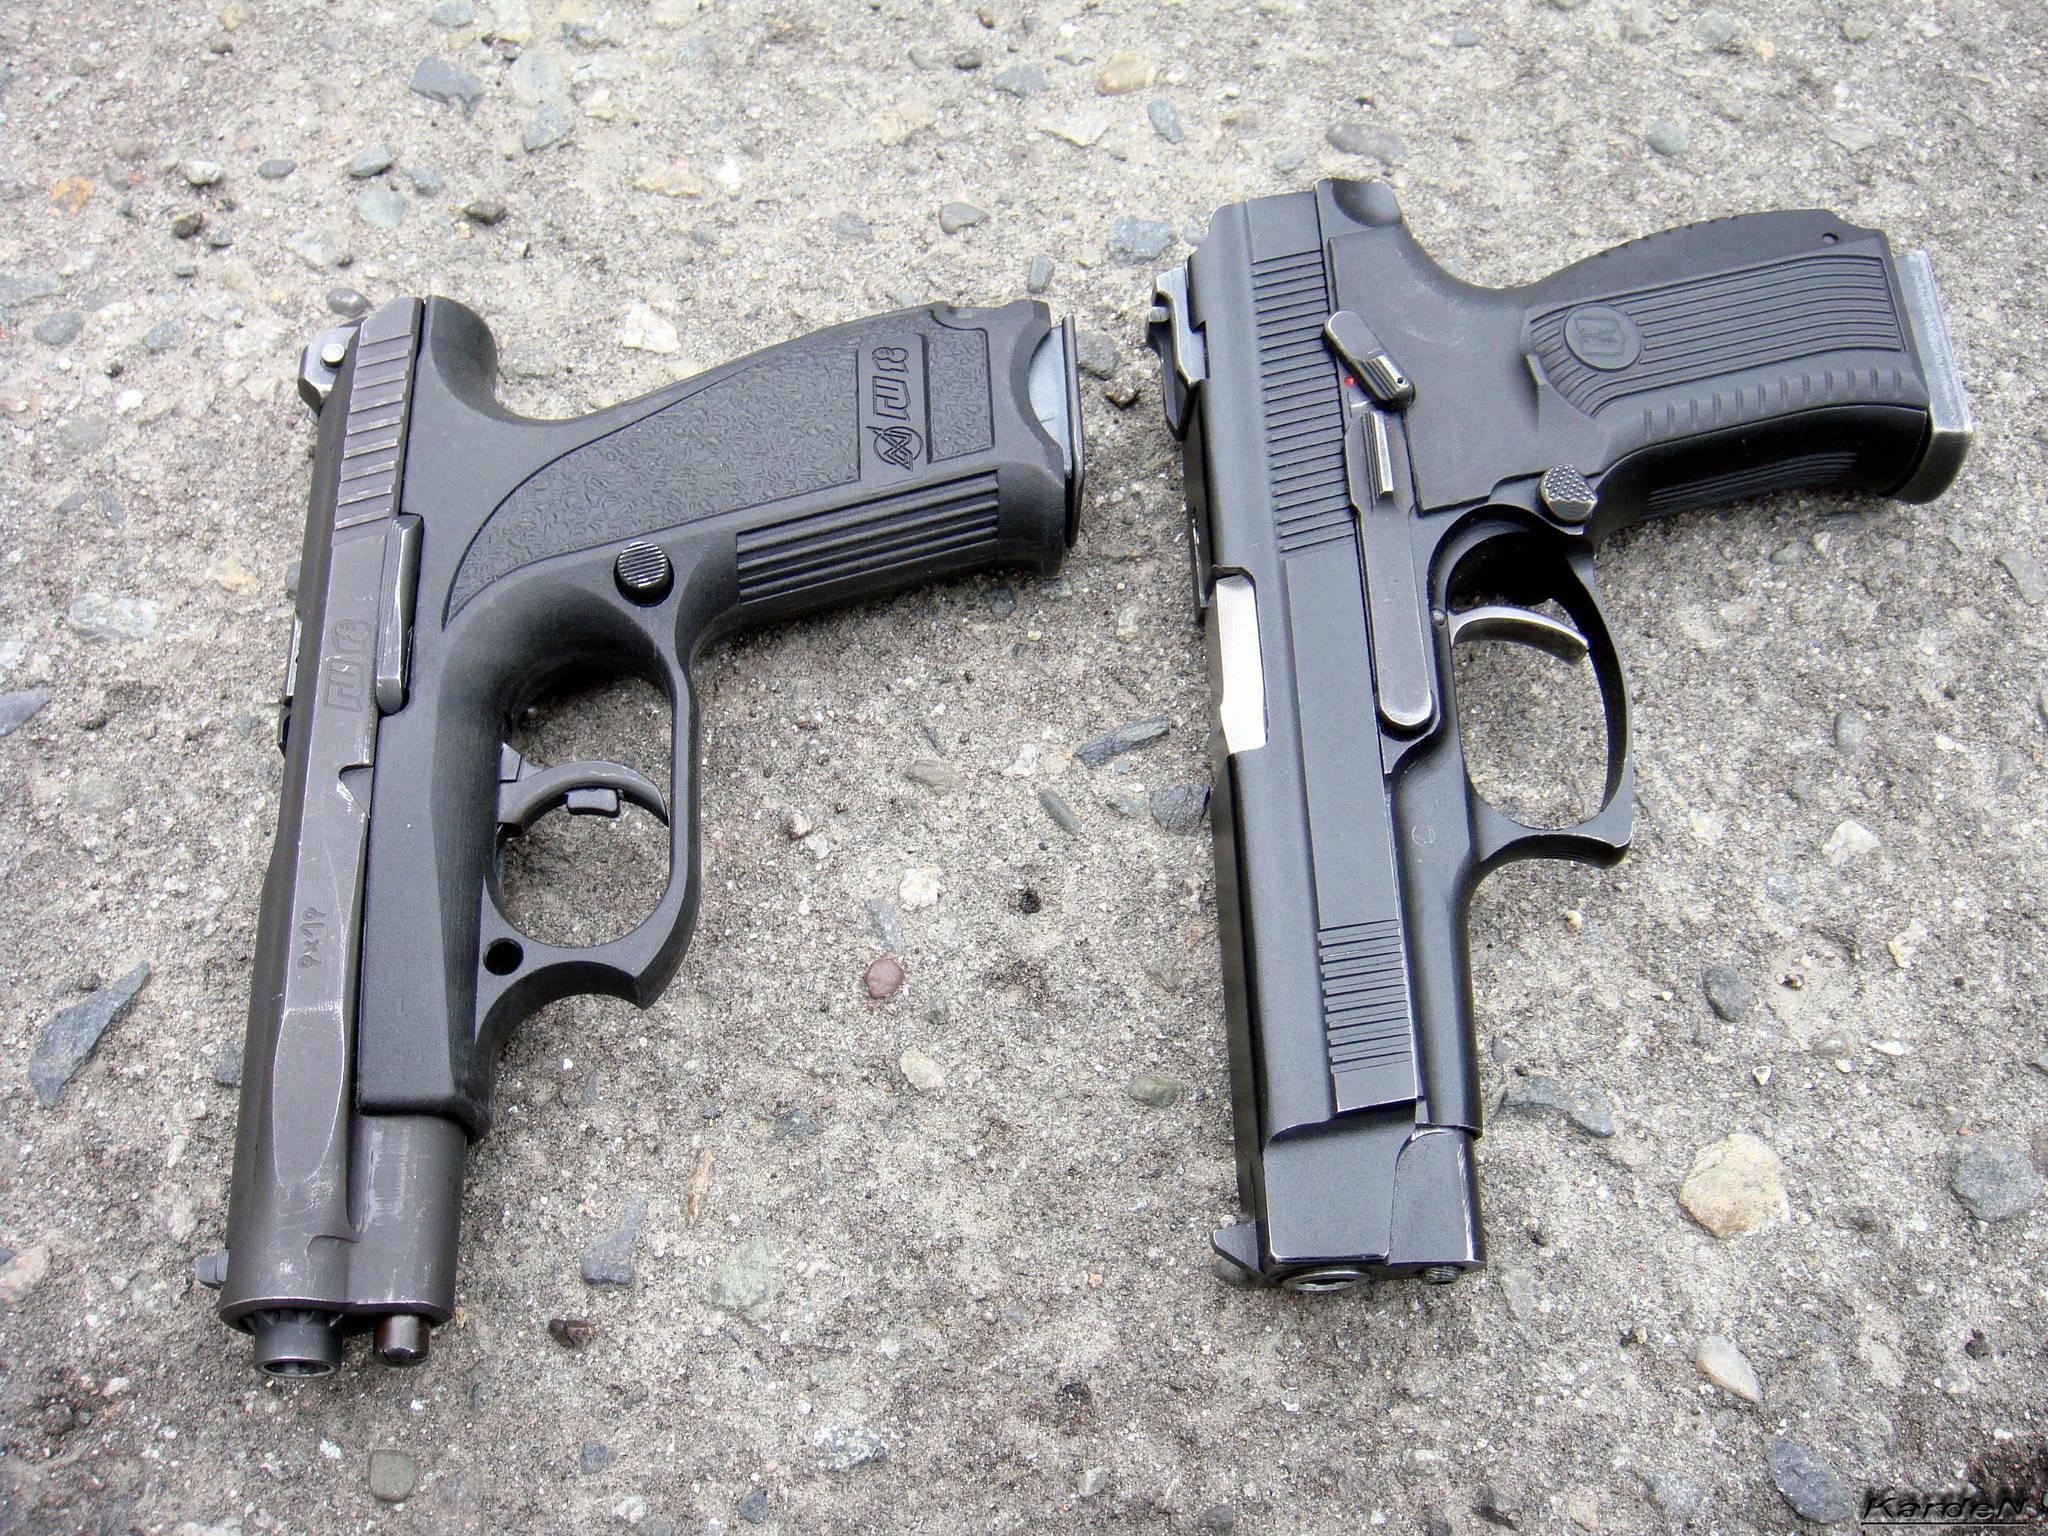 Пистолет грязева-шипунова гш-18 - плюсы и минусы.